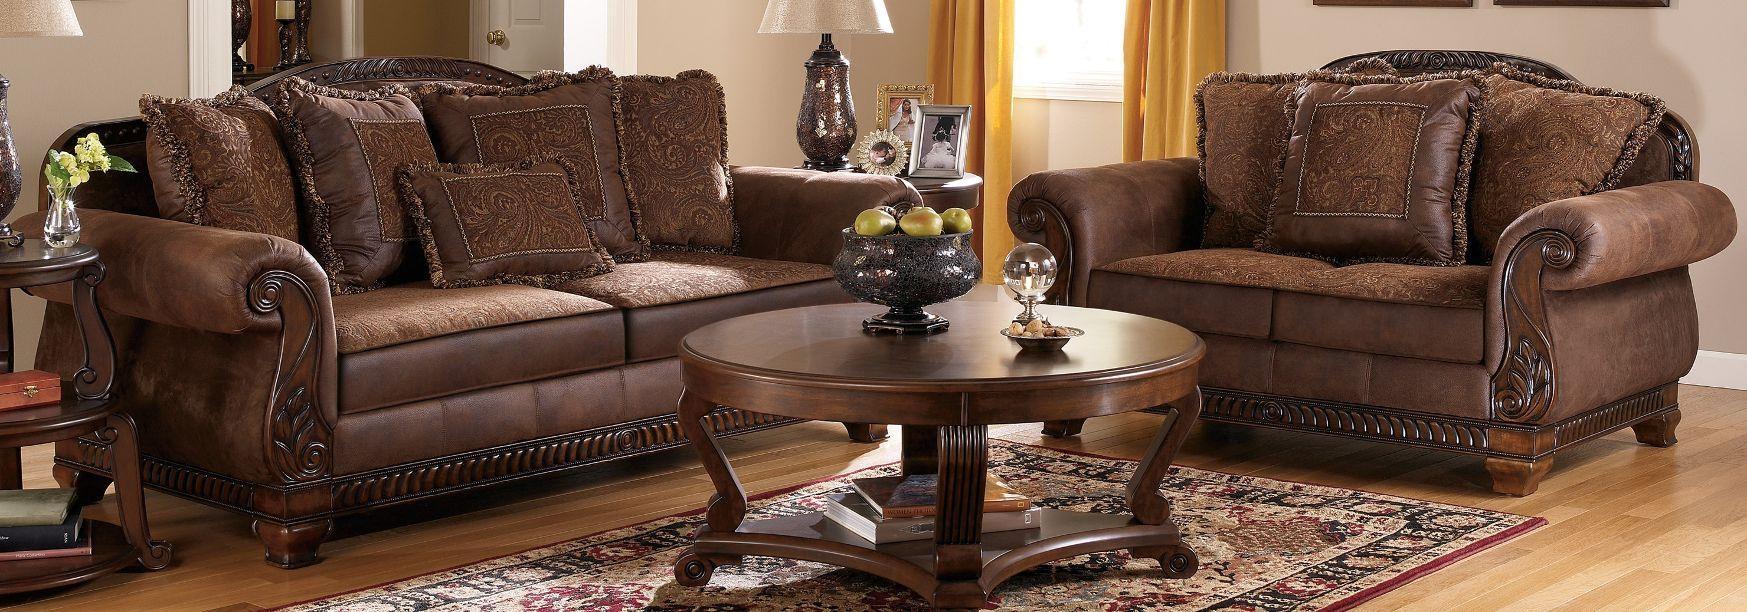 Stunning Bradington Truffle Living Room Set Contemporary – Home In Bradington Truffle (View 2 of 20)